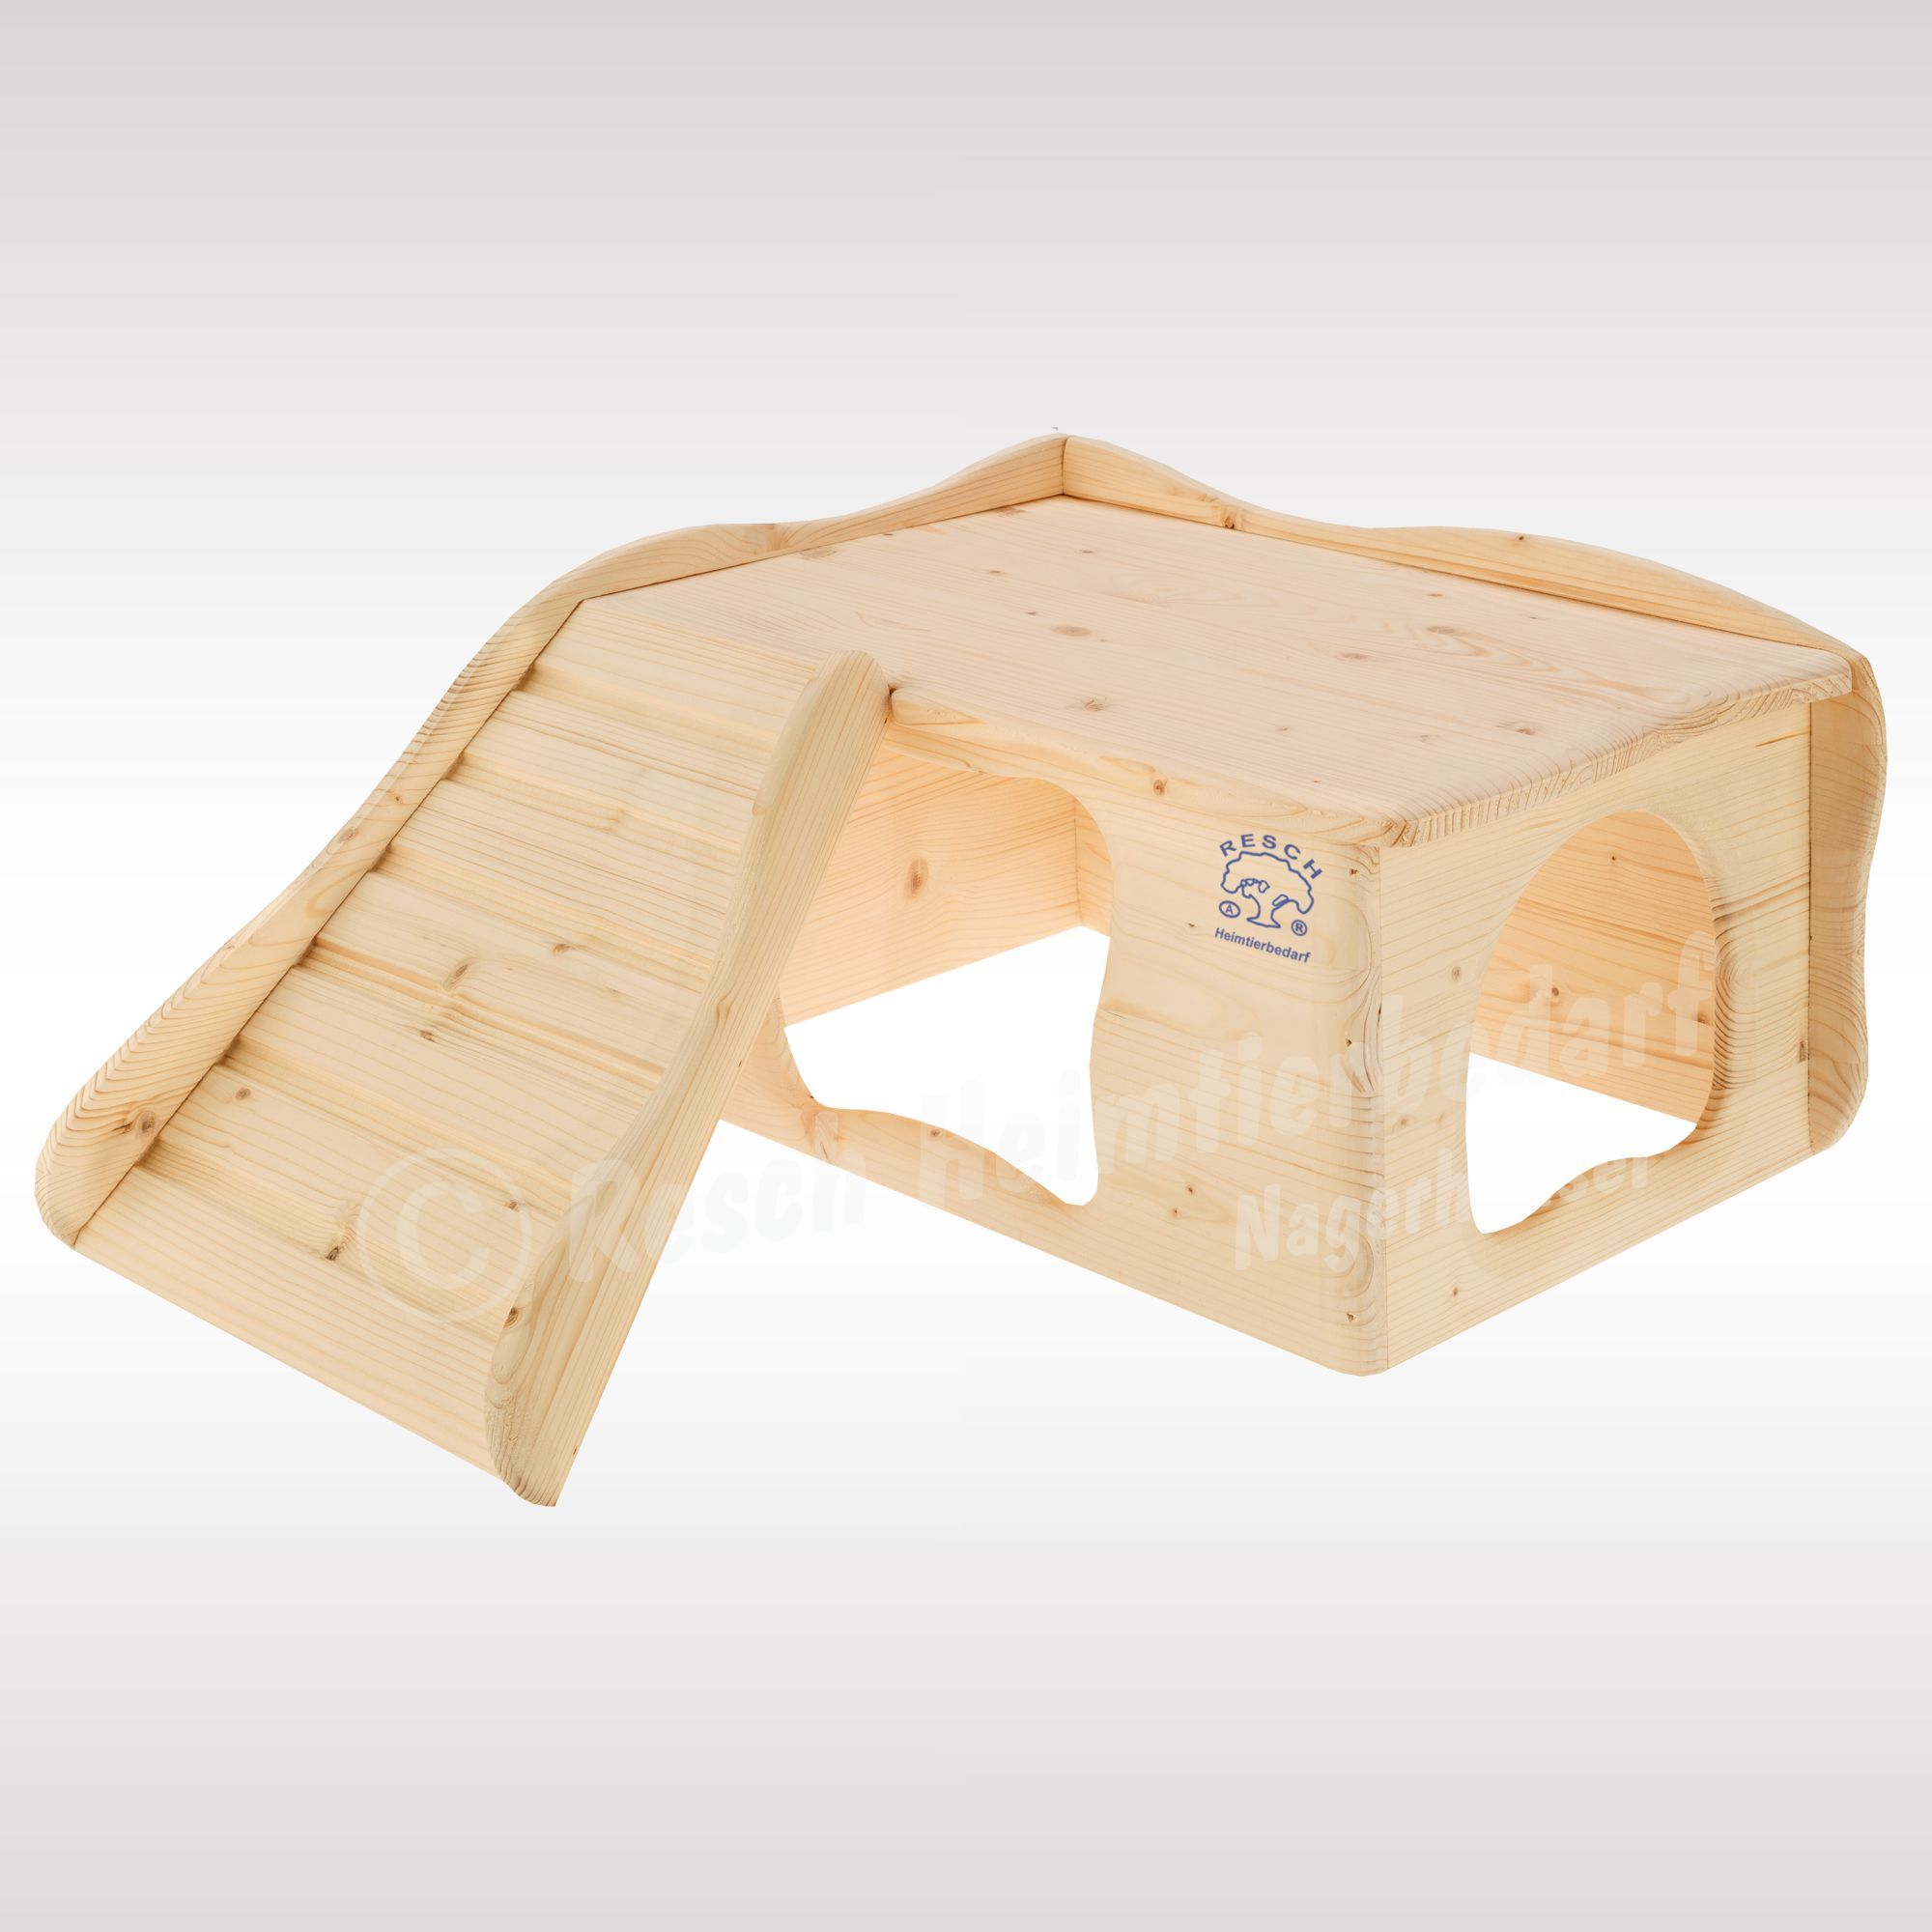 Produkte Archiv Heimtierbedarf Resch Nagerhaus Heimtierbedarf Meerschweinchen Haus Hamster Ideen